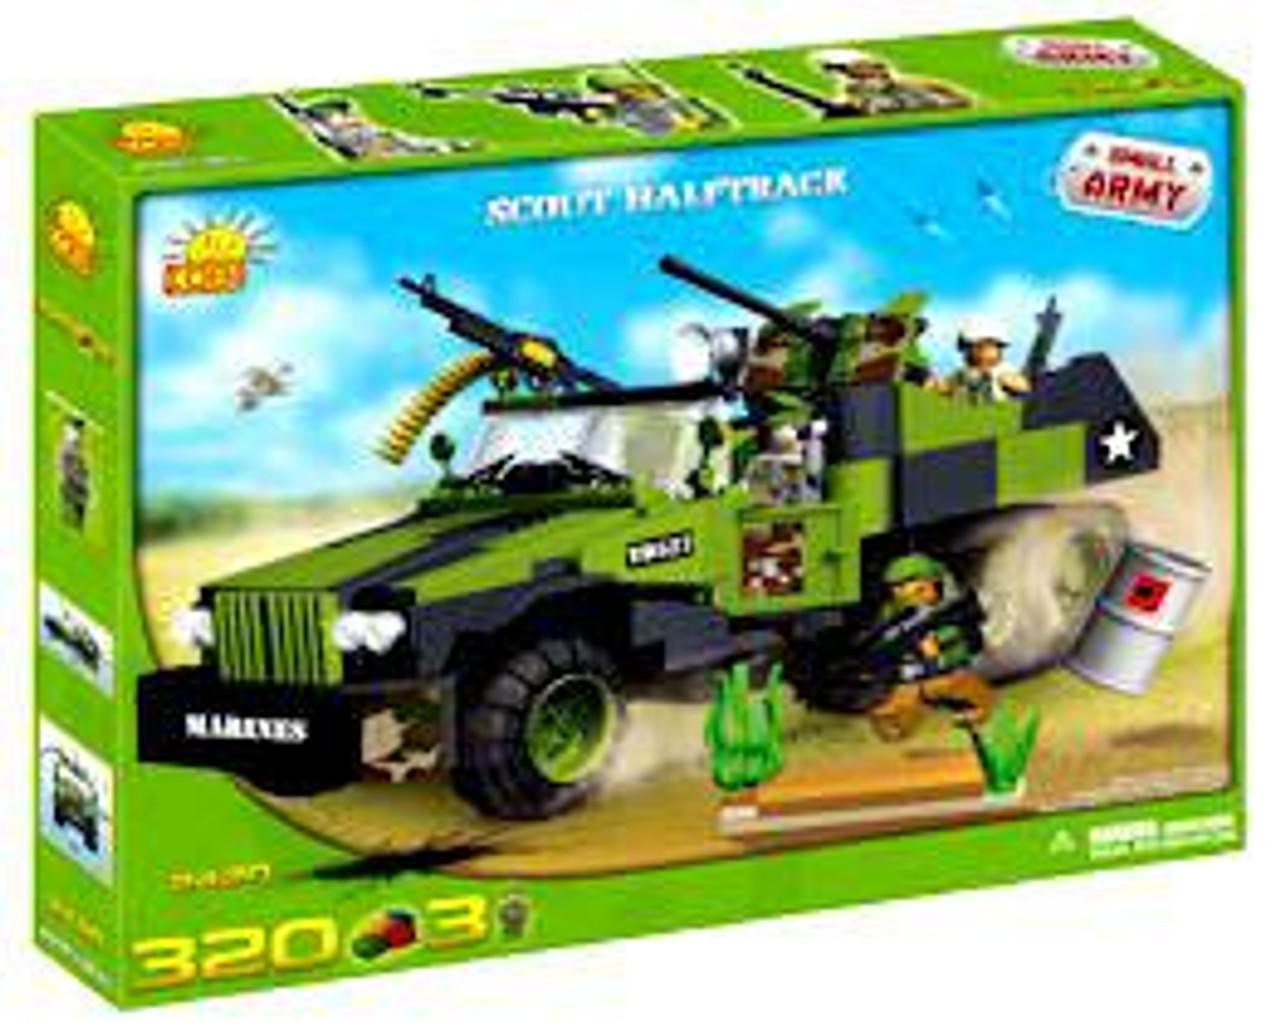 COBI Blocks Small Army Scout Halftrack Set #2420